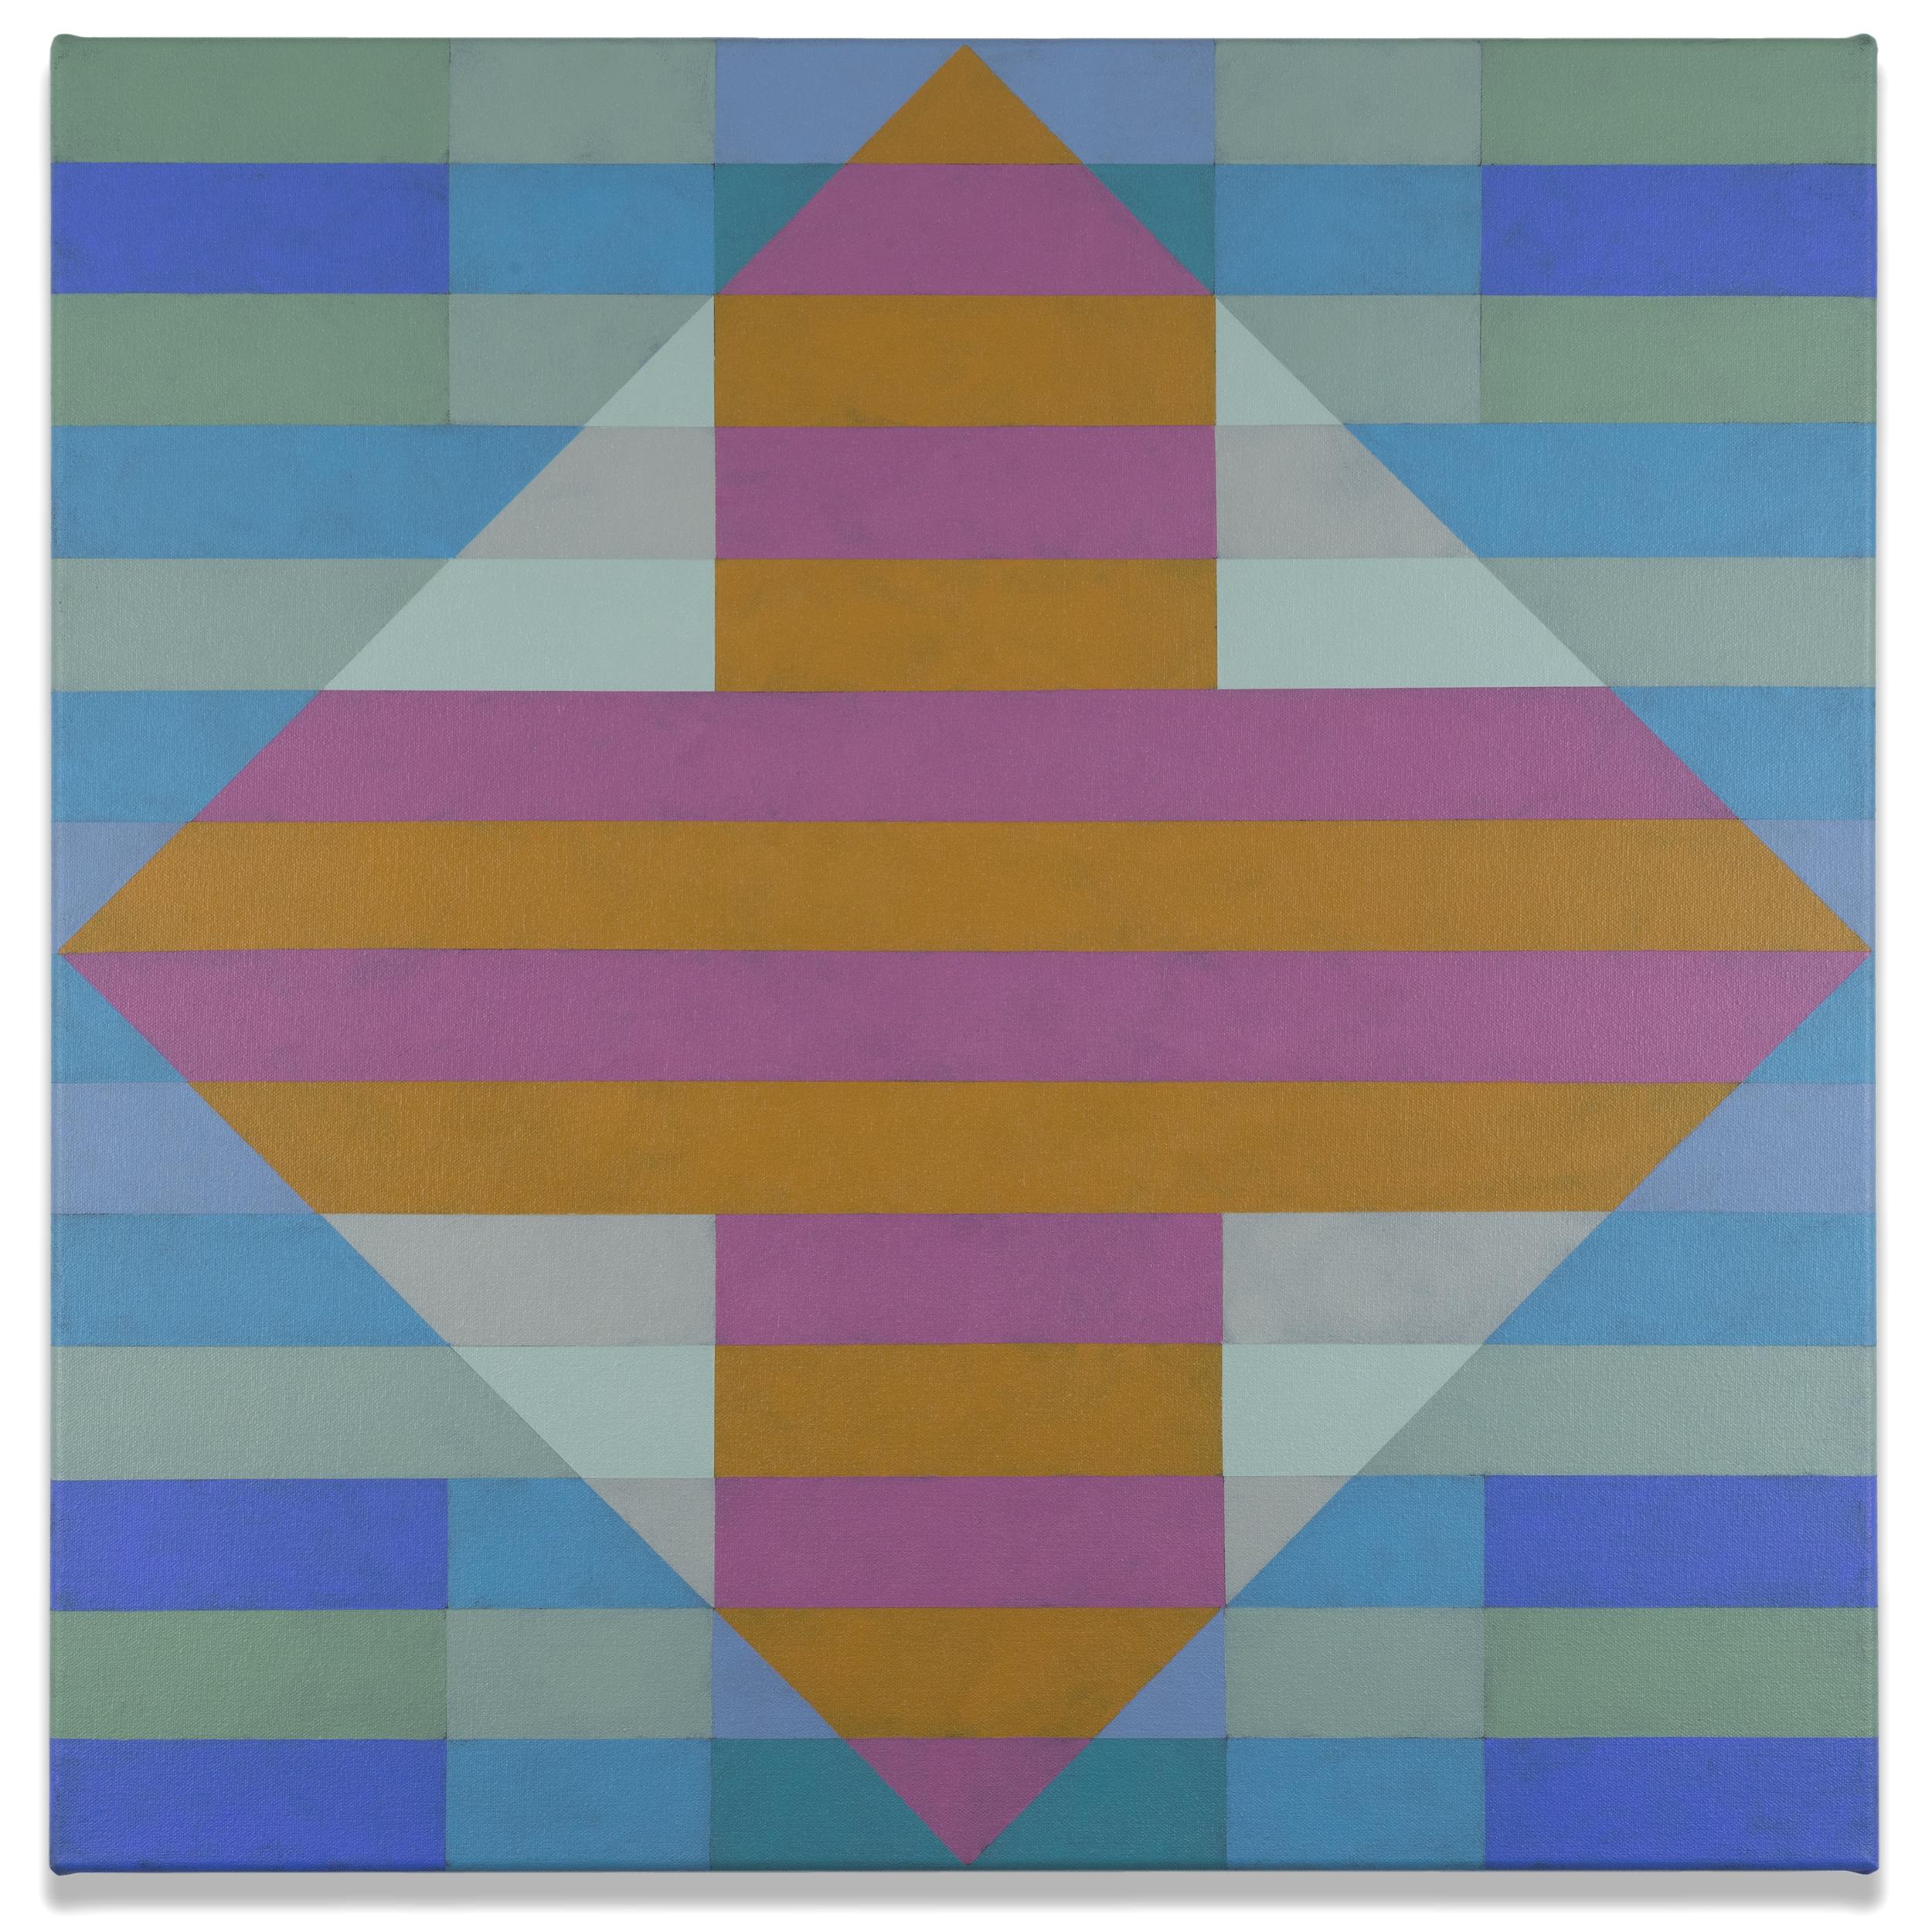 Qualia 414  acrylic on canvas 24 x 24 inches 2017